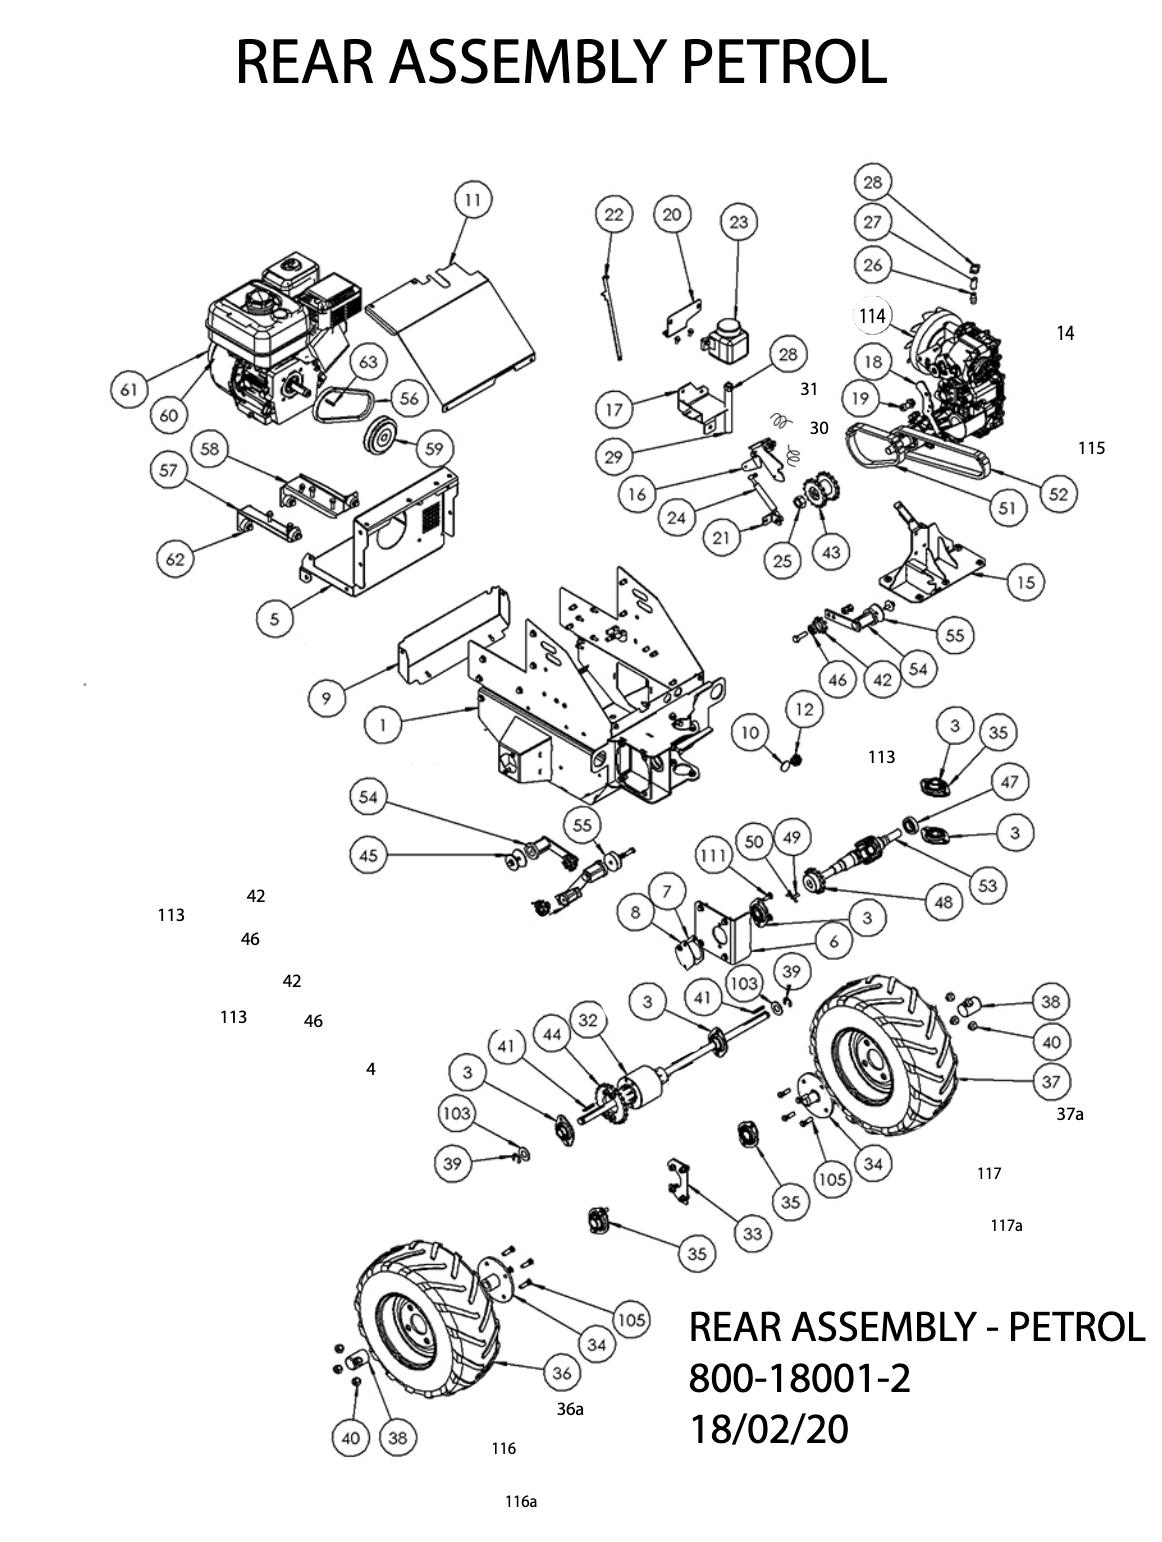 Rear Assembly Petrol Diagram